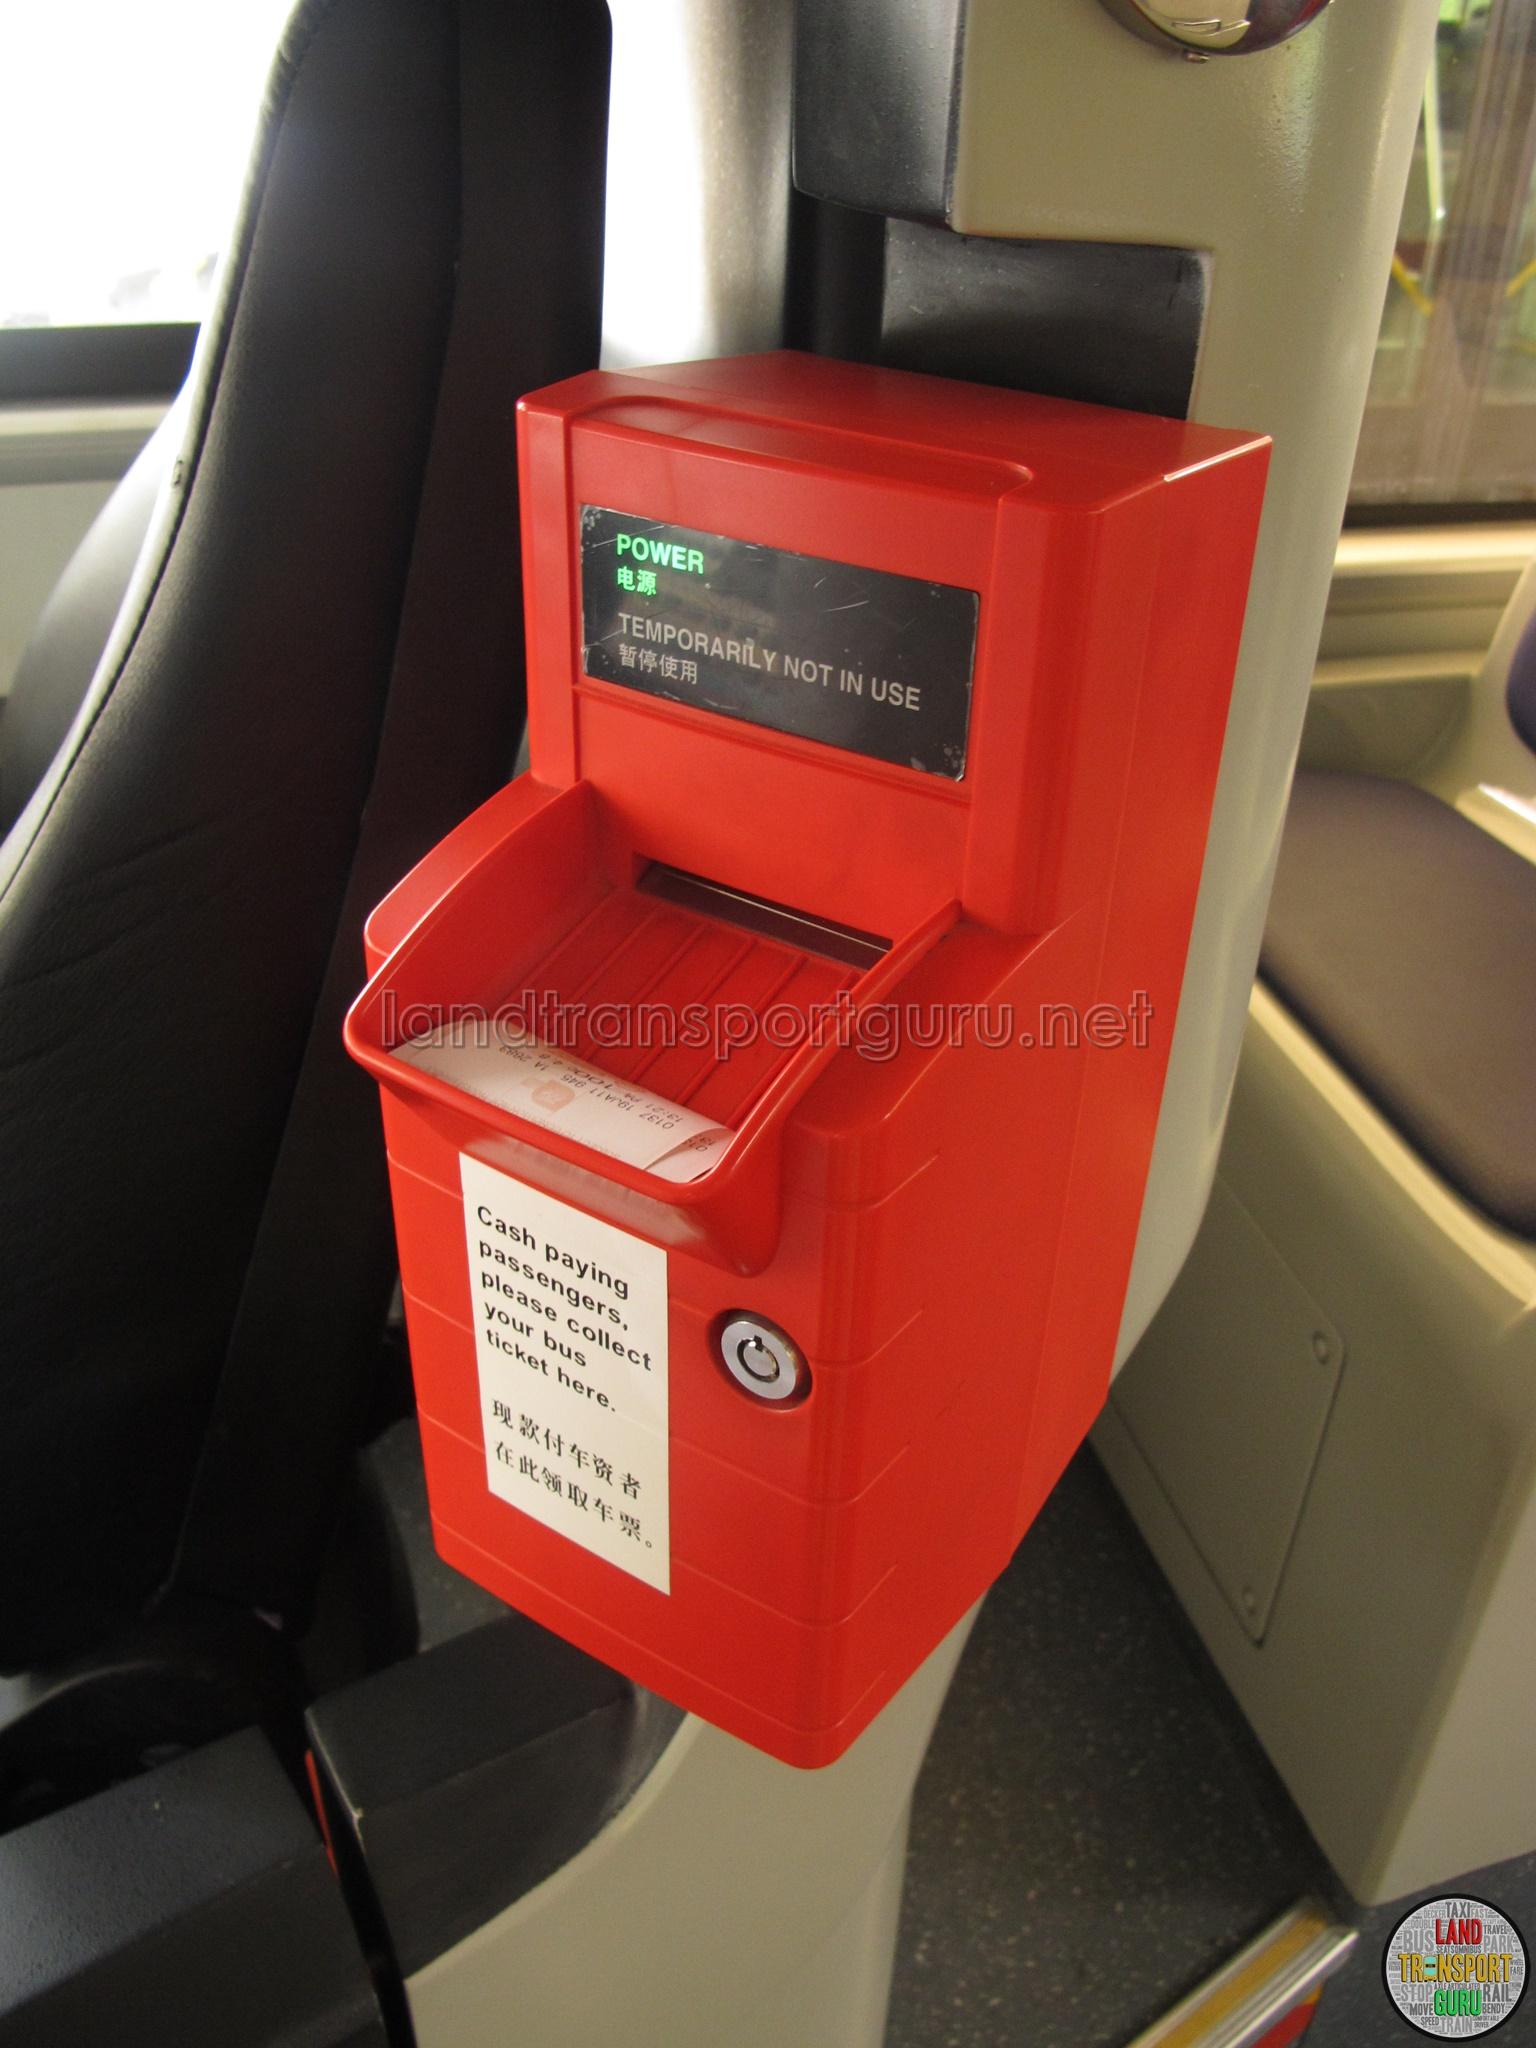 Automatic Ticket Dispenser ~ Ticket dispenser land transport guru